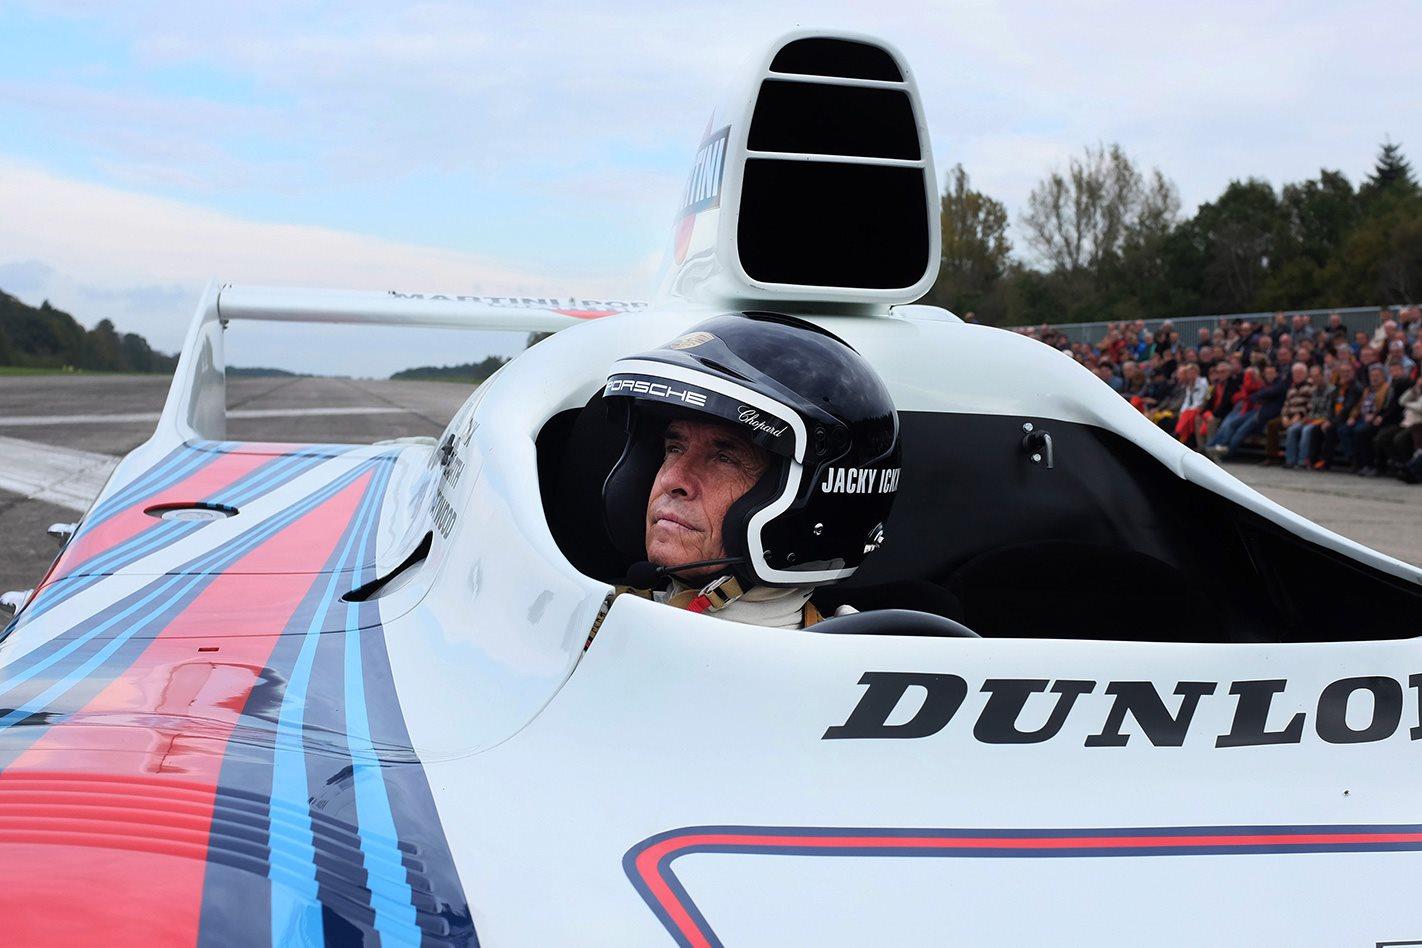 Racing legend Jacky Ickx